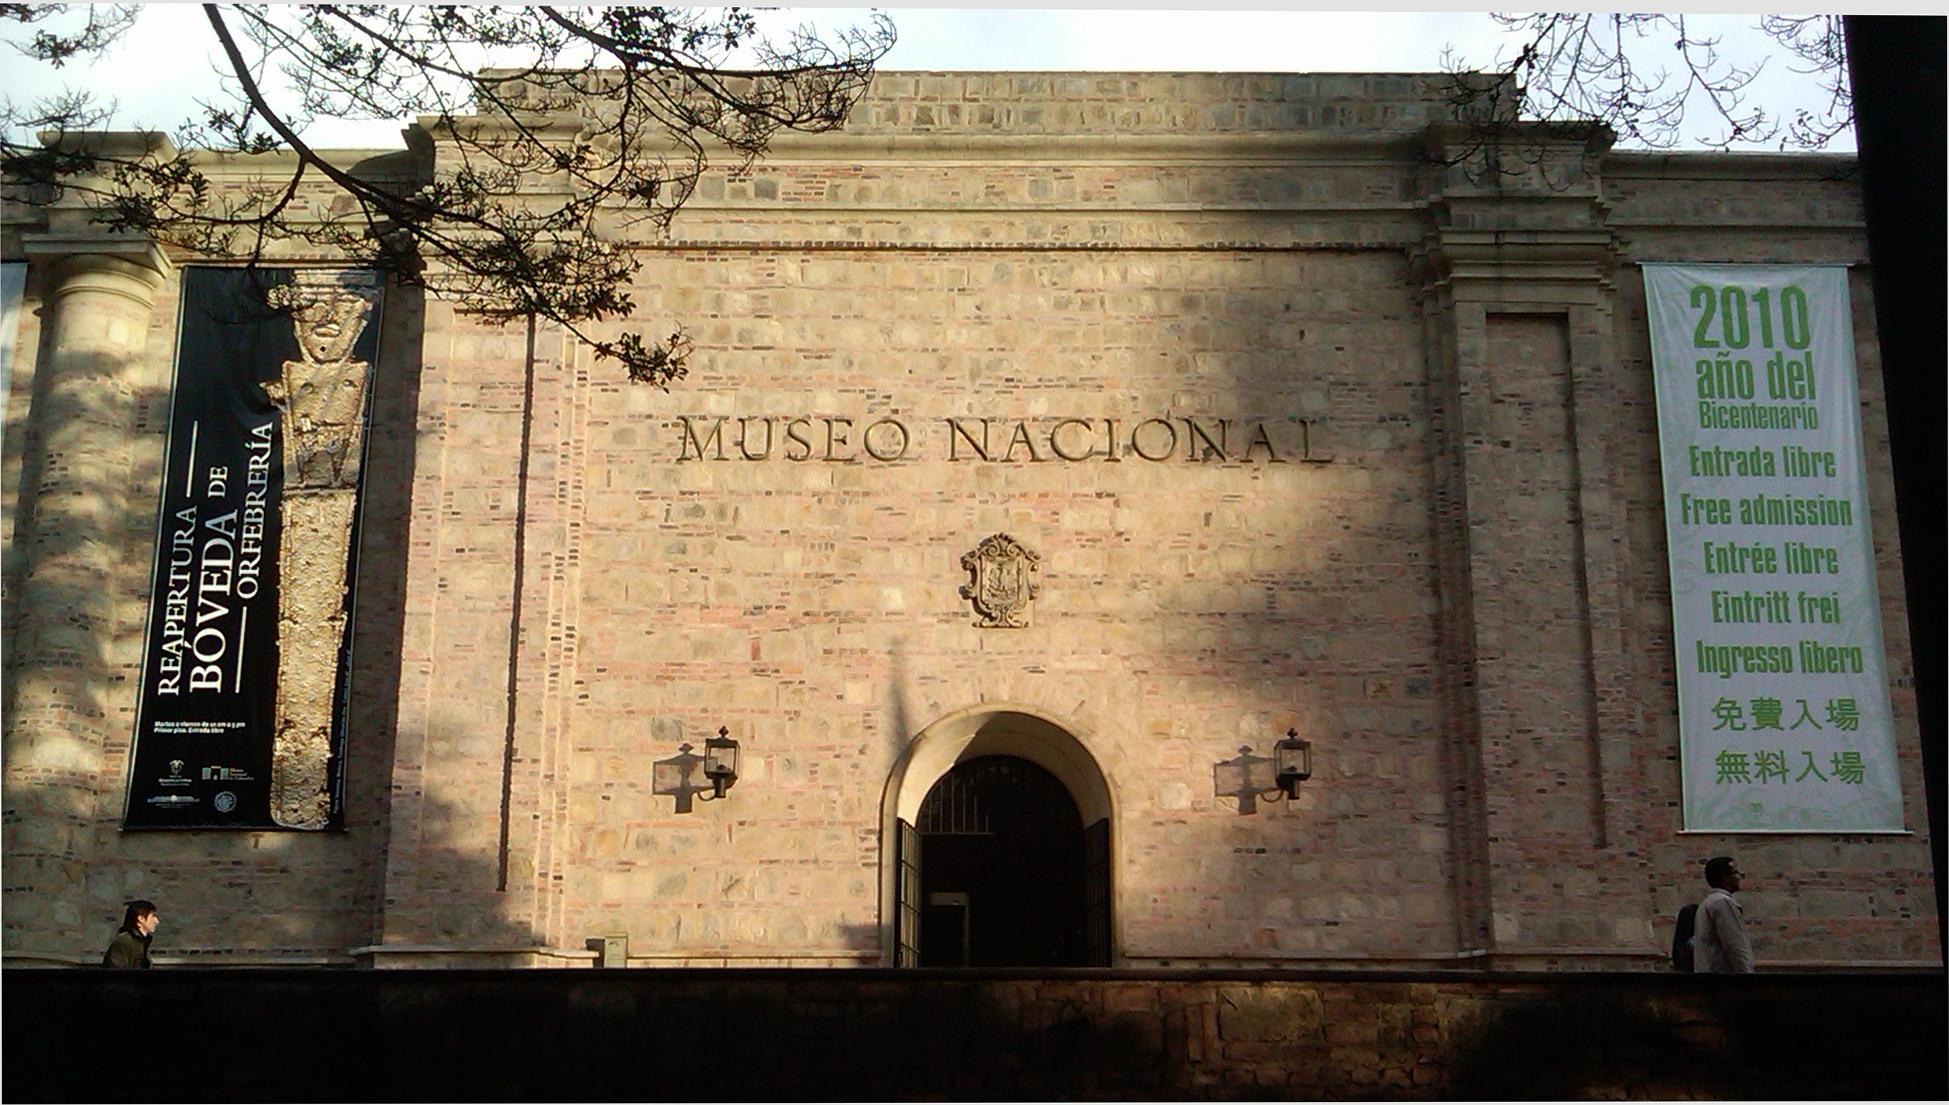 fundacion museo nacional: